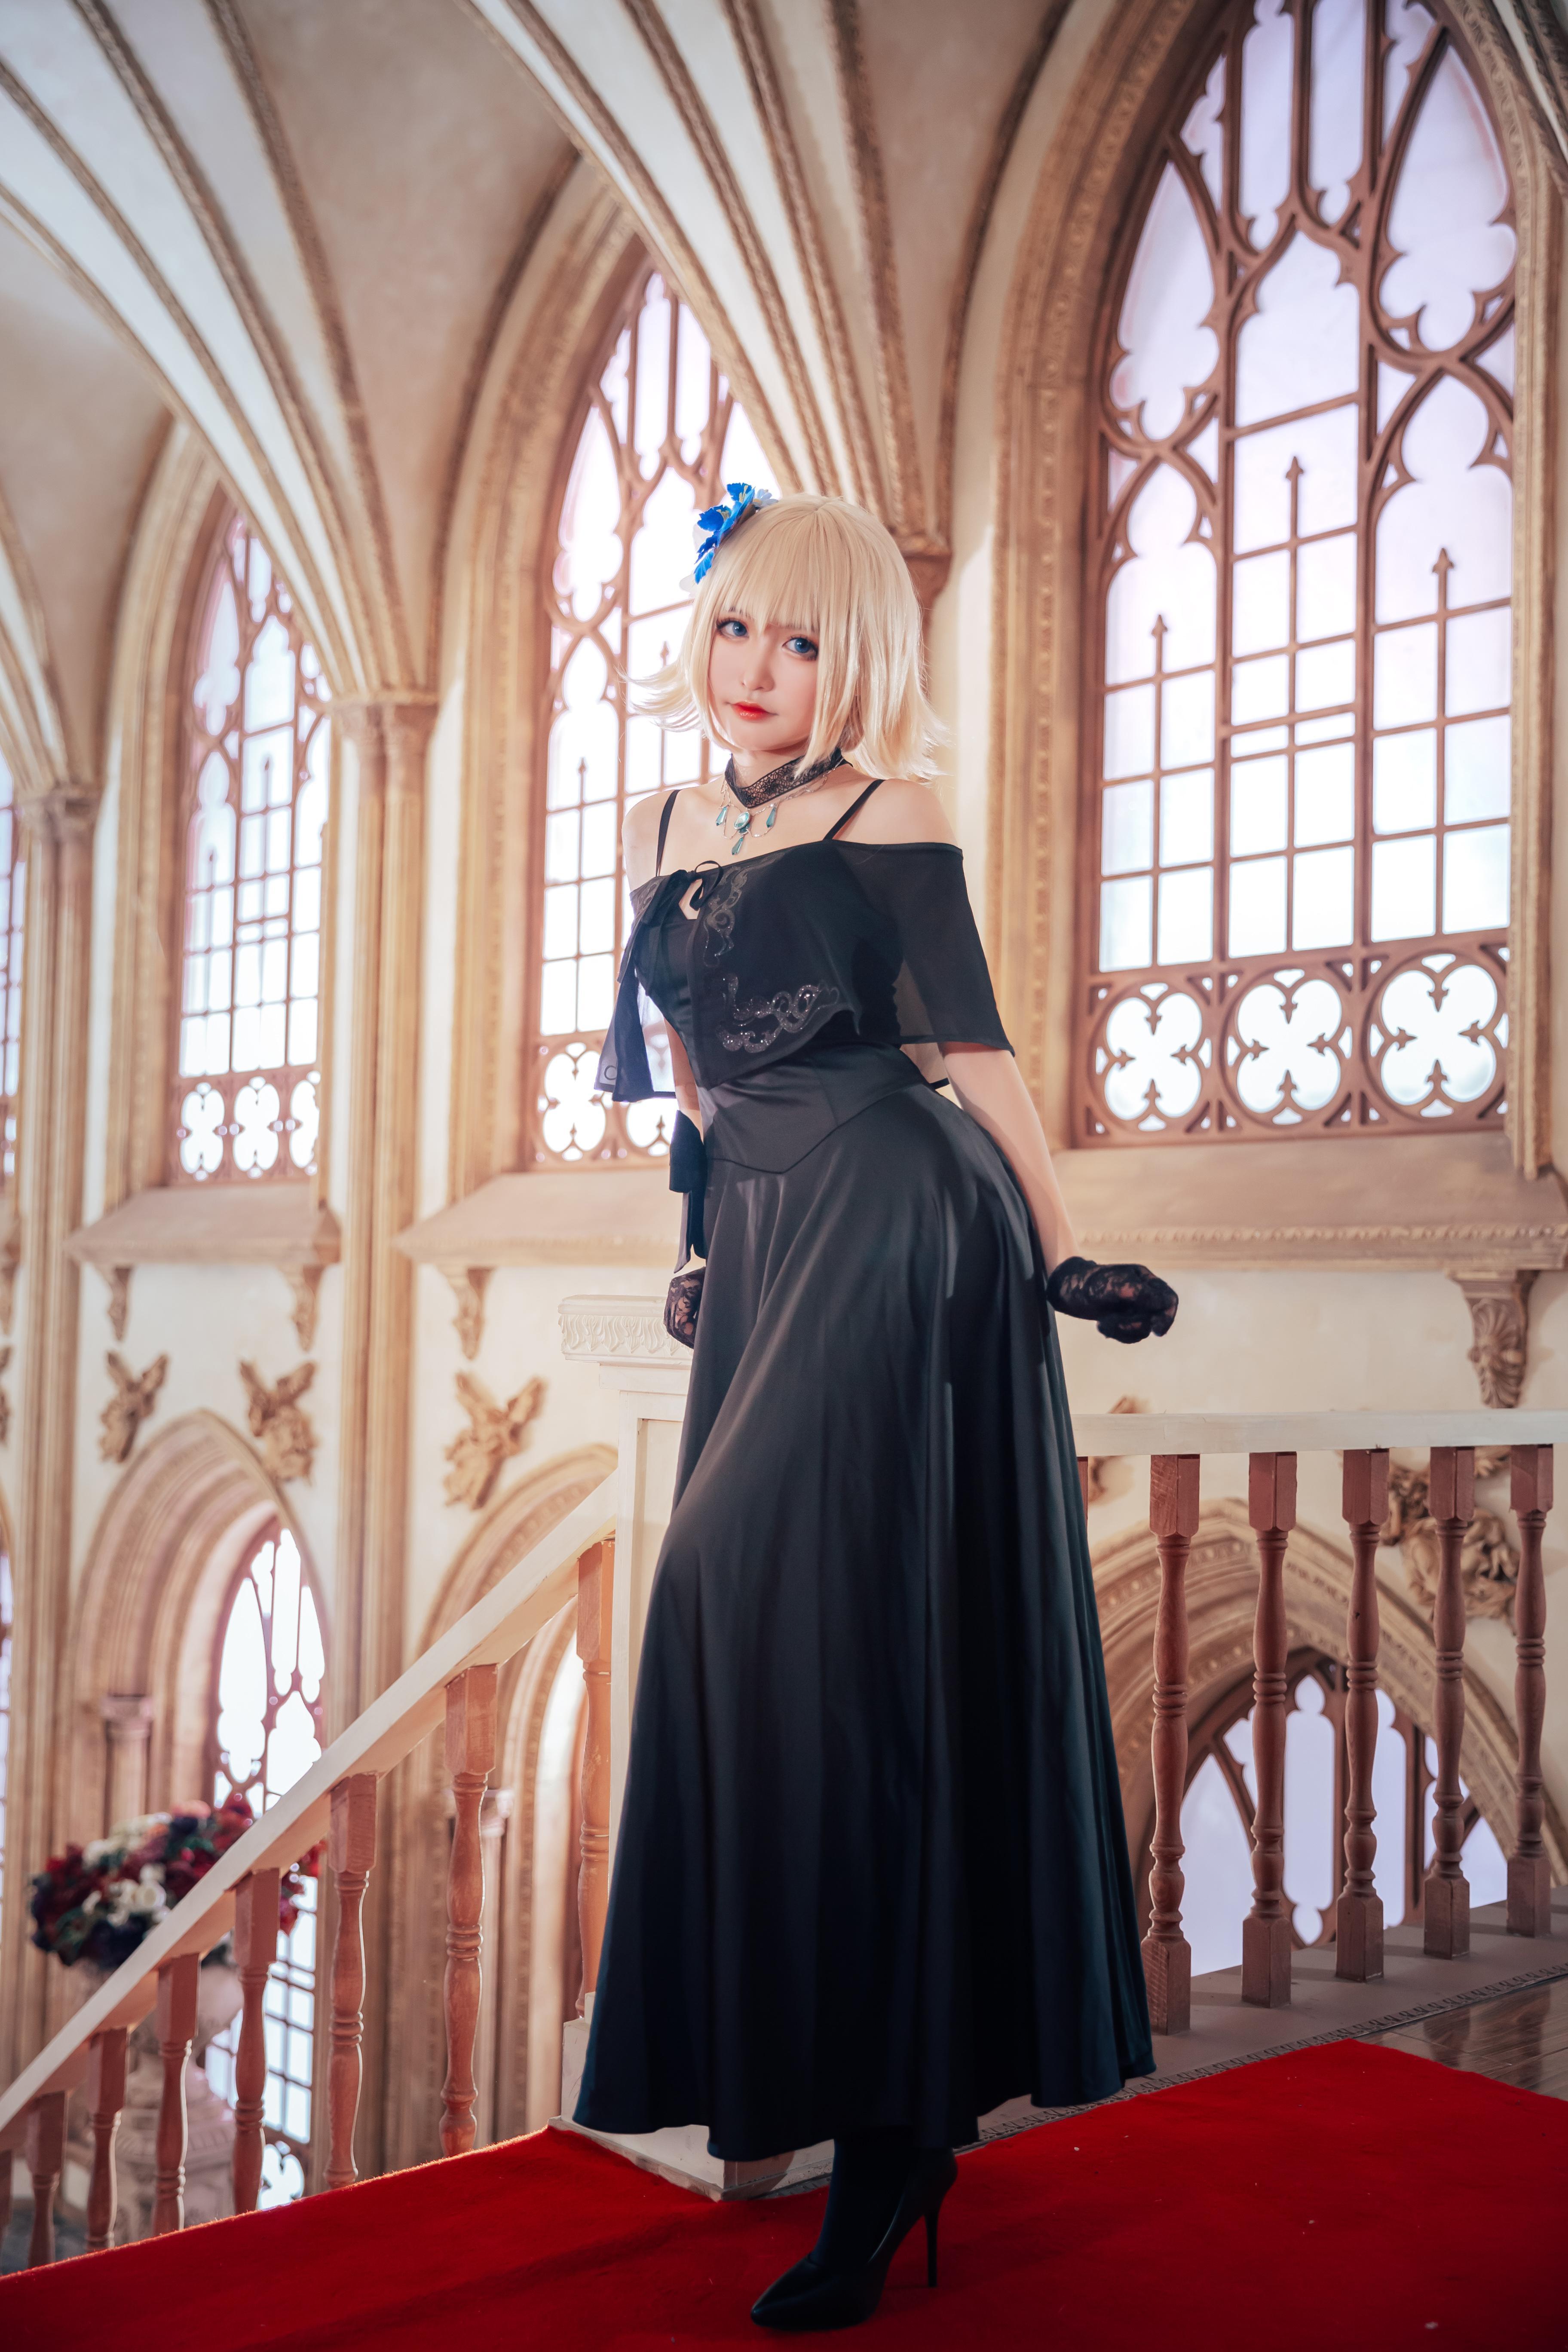 《FATE/GRAND ORDER》正片cosplay【CN:泡泡_Julia】-第10张